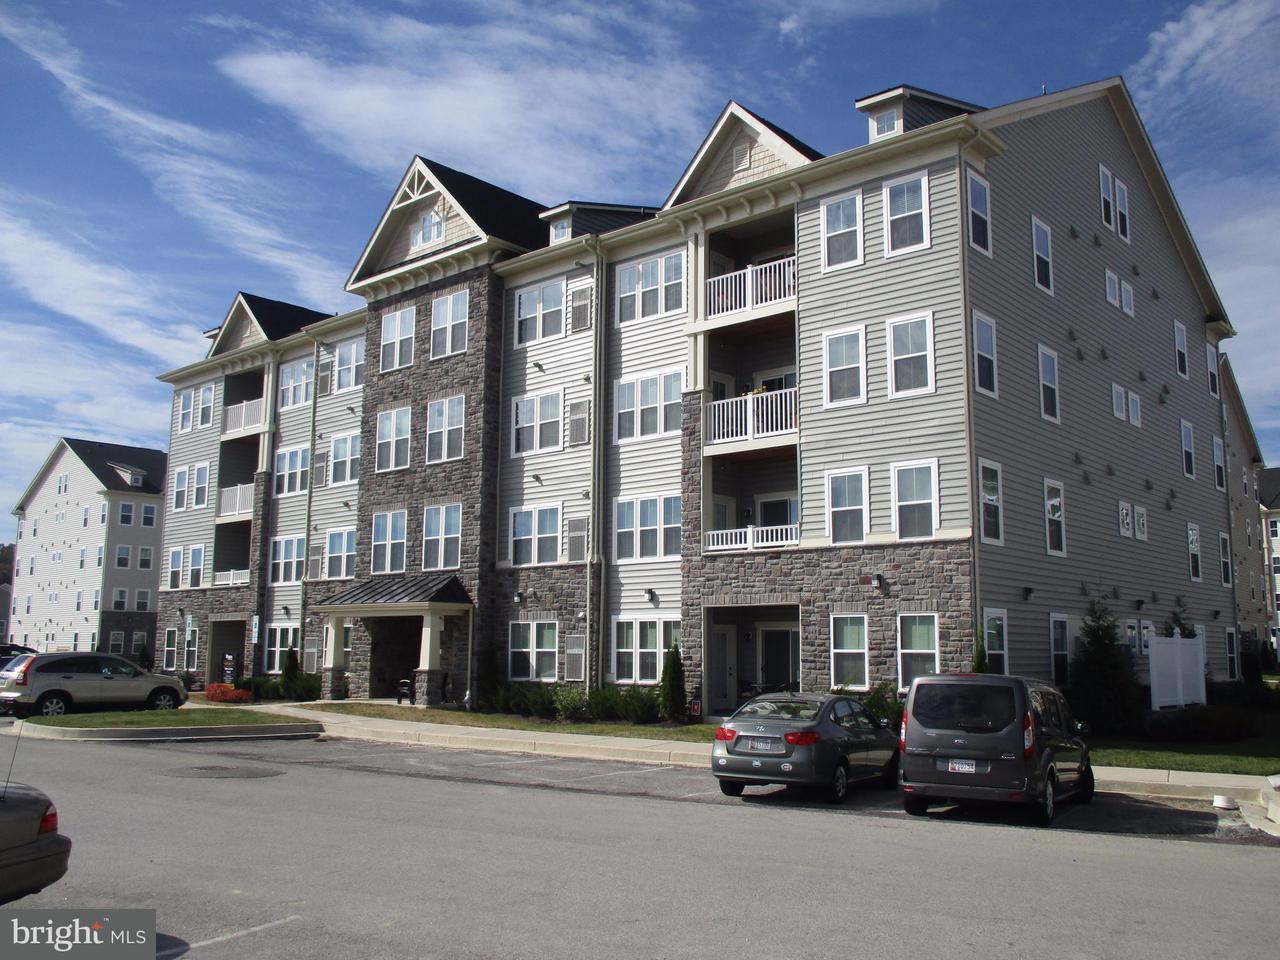 Condominium for Rent at 2121 John Stuart Rd #n Marriottsville, Maryland 21104 United States